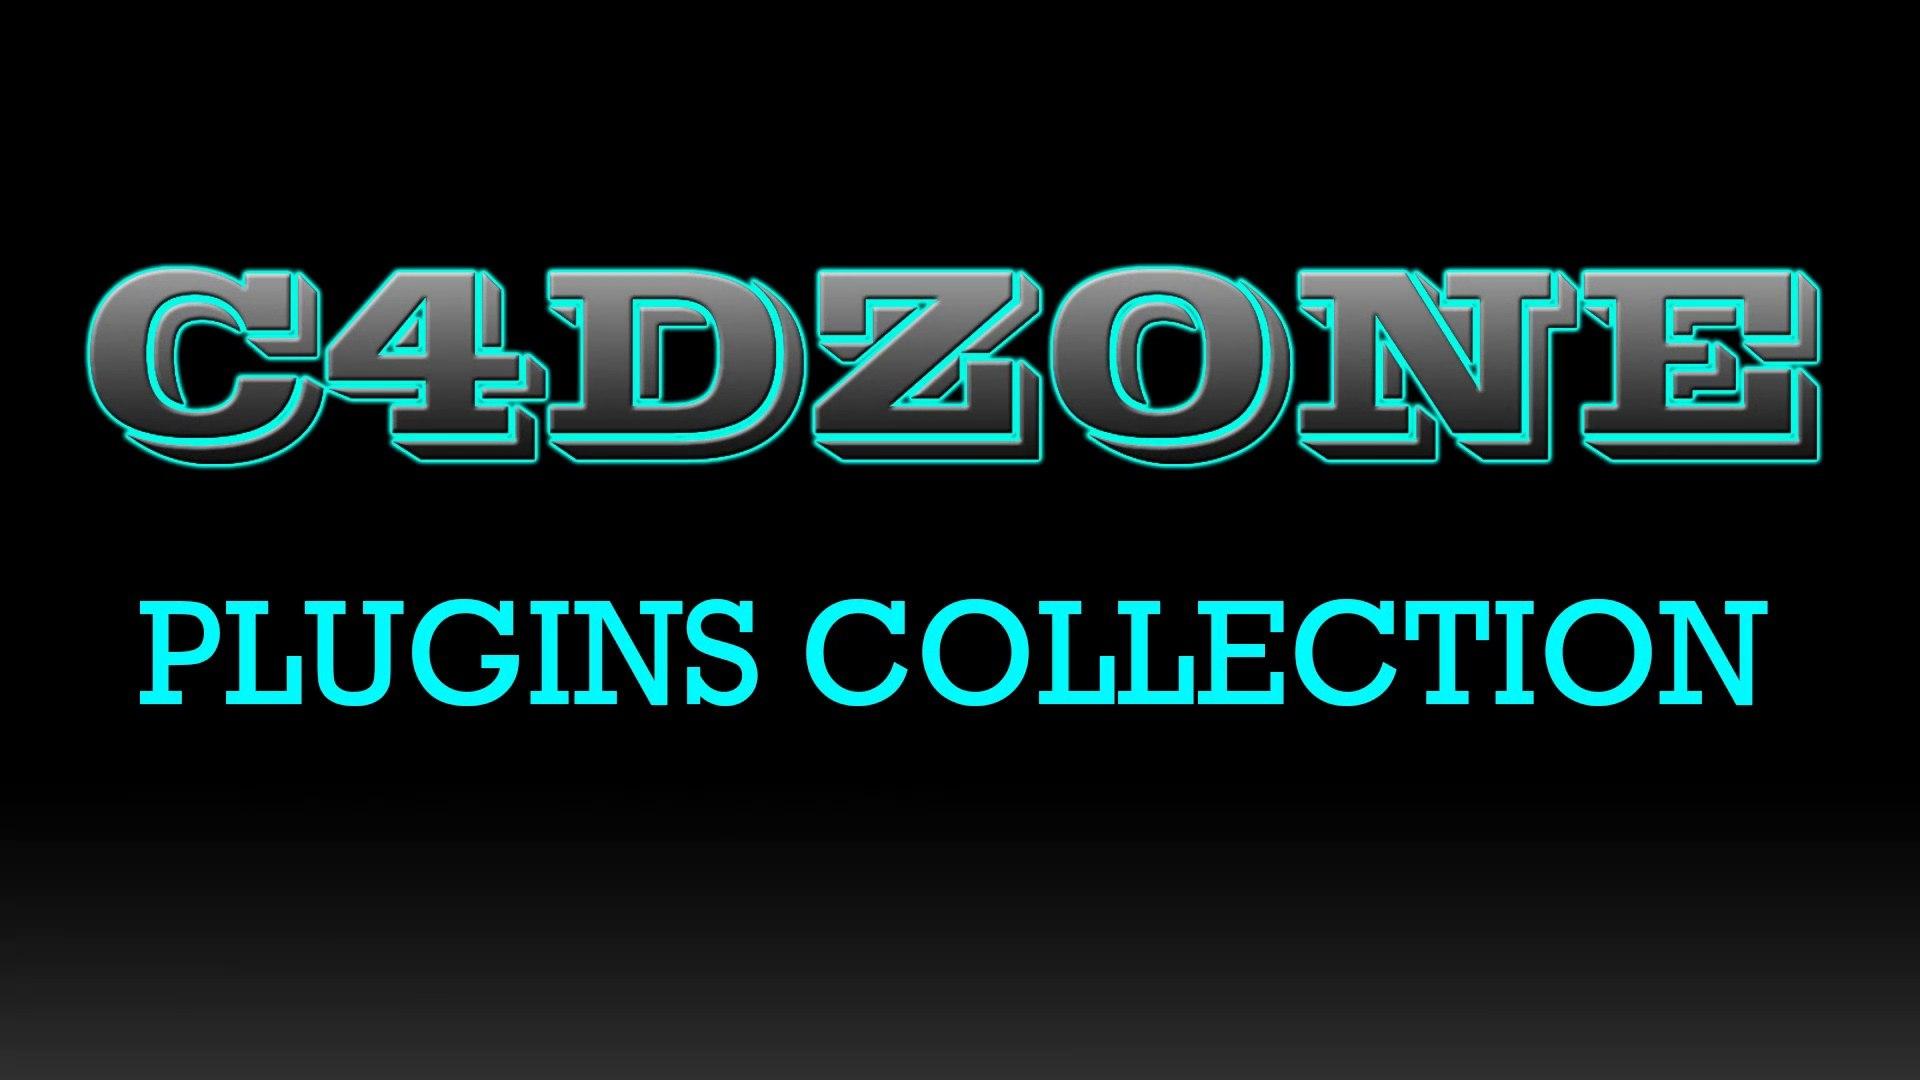 cinema 4d plugins collection  C4DZone Complete Col